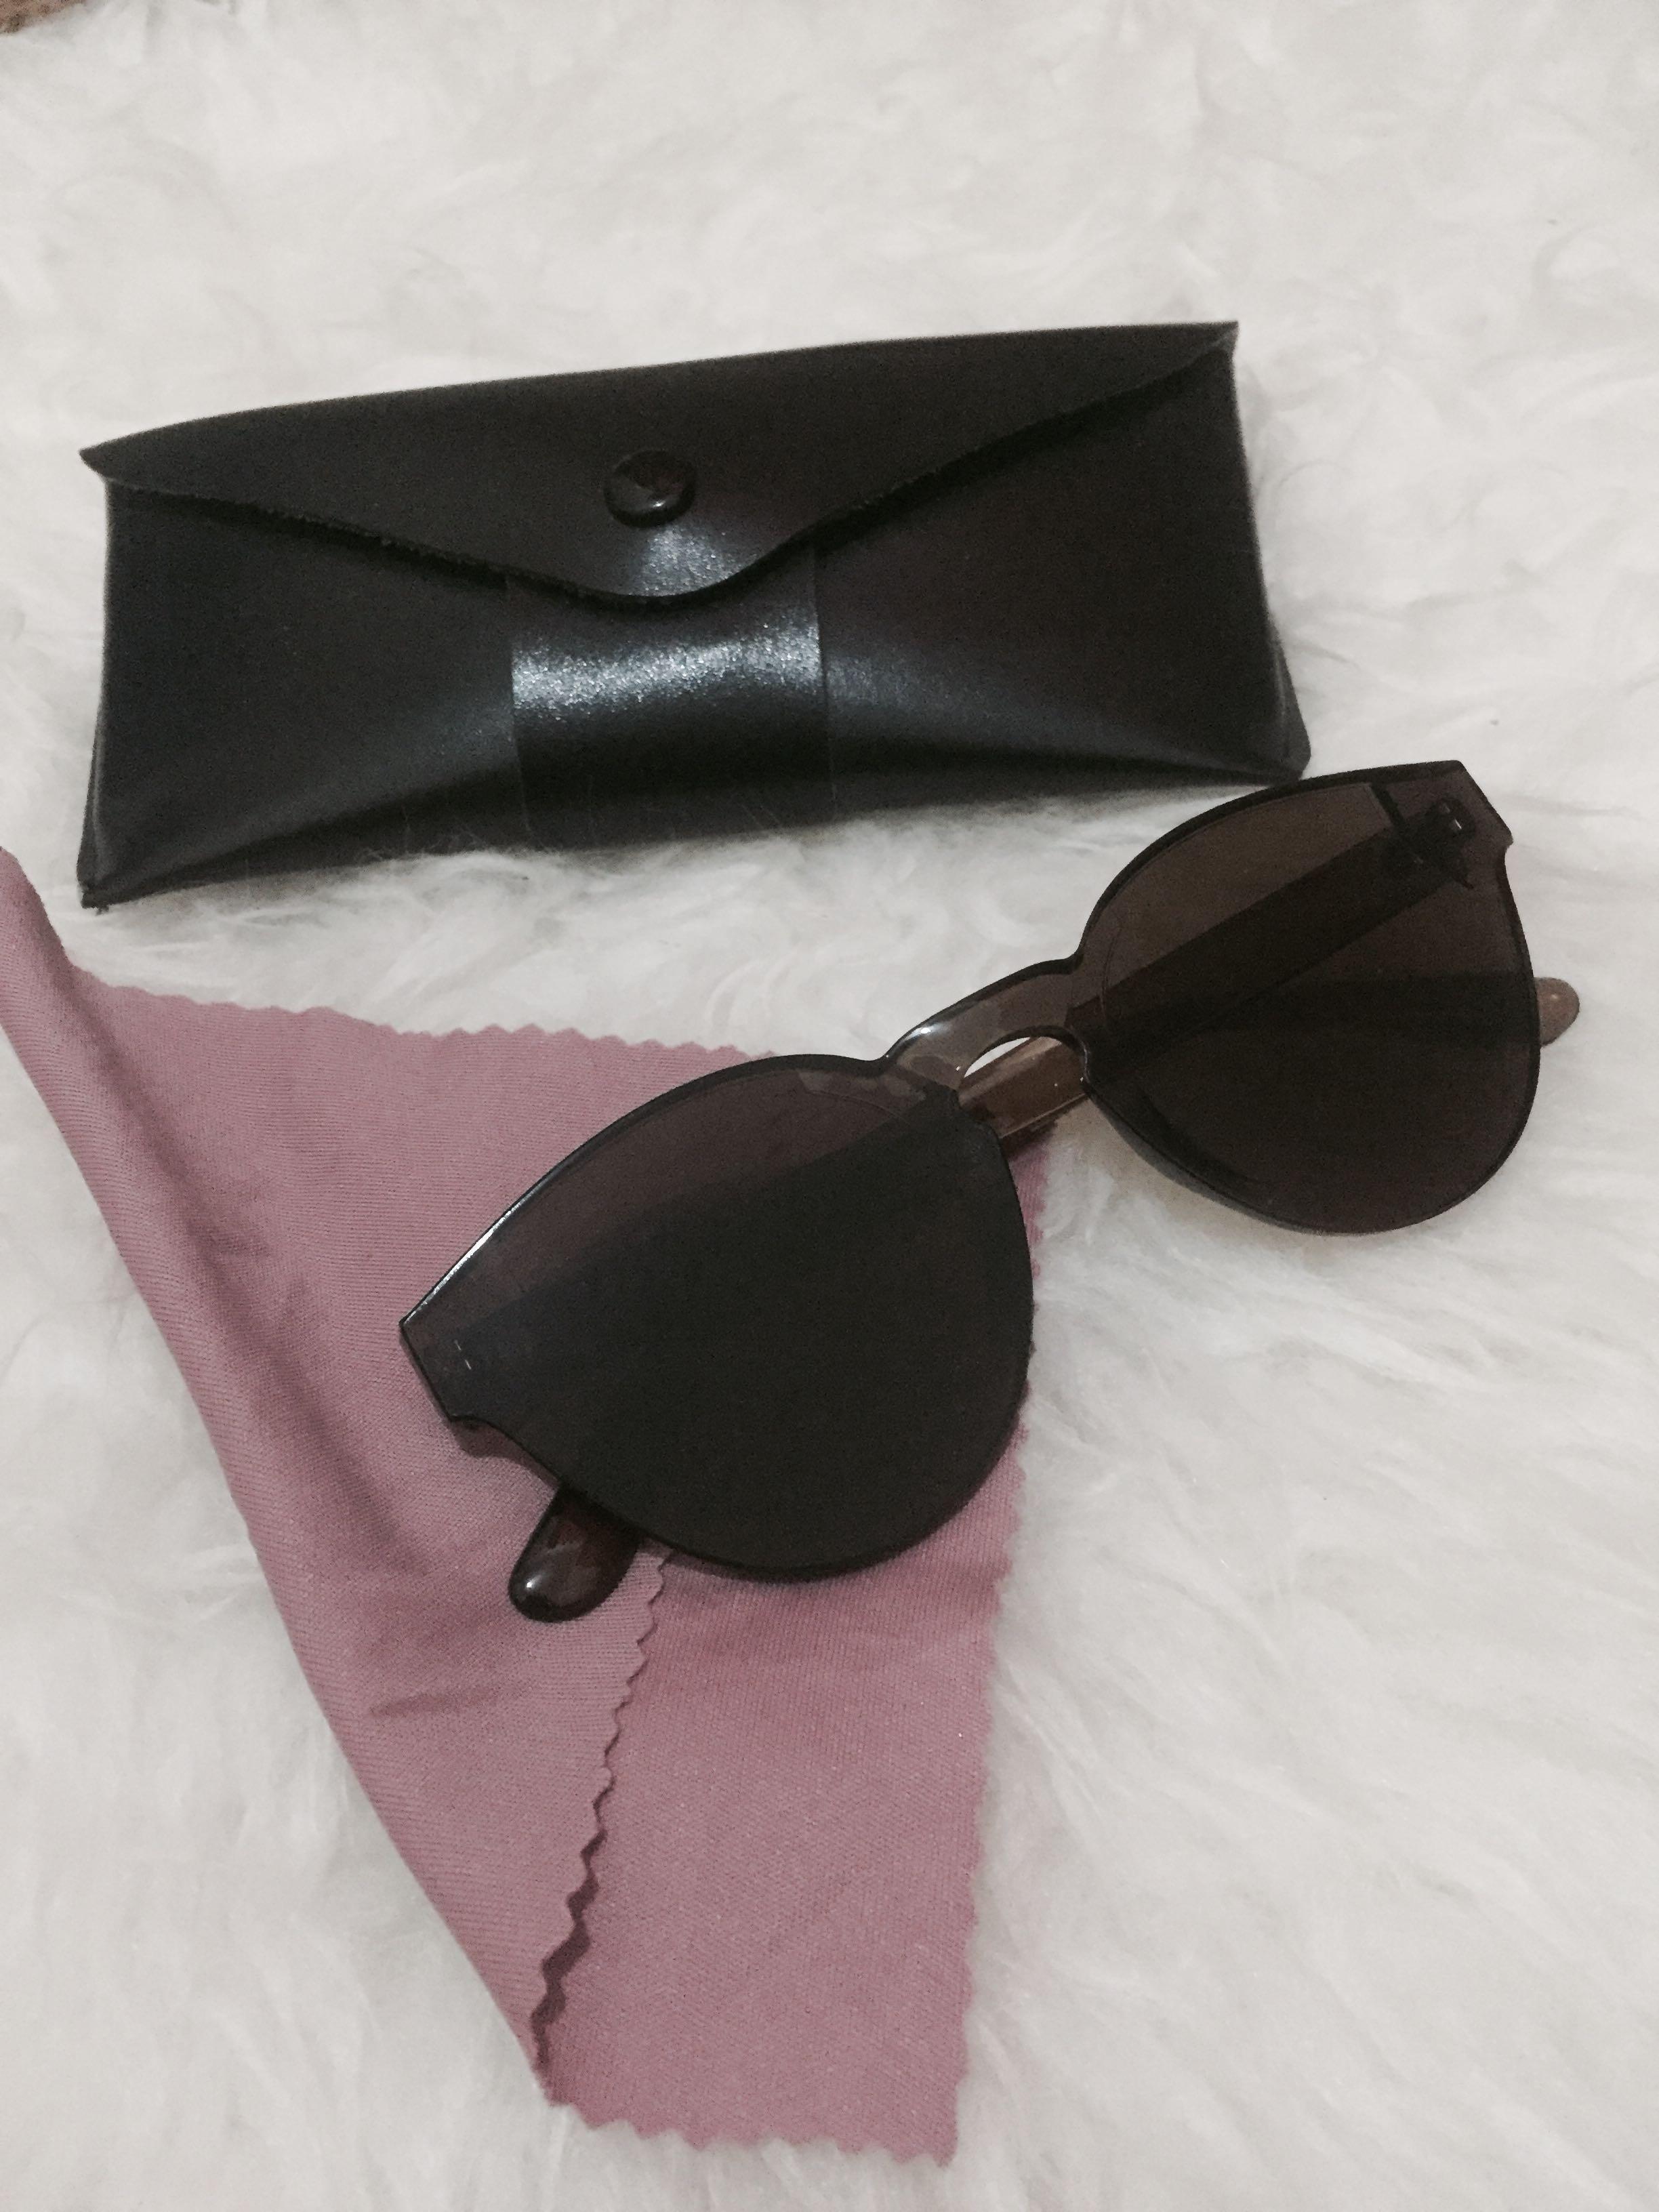 SALE FREE ONGKIR JAKARTA Sunglasses